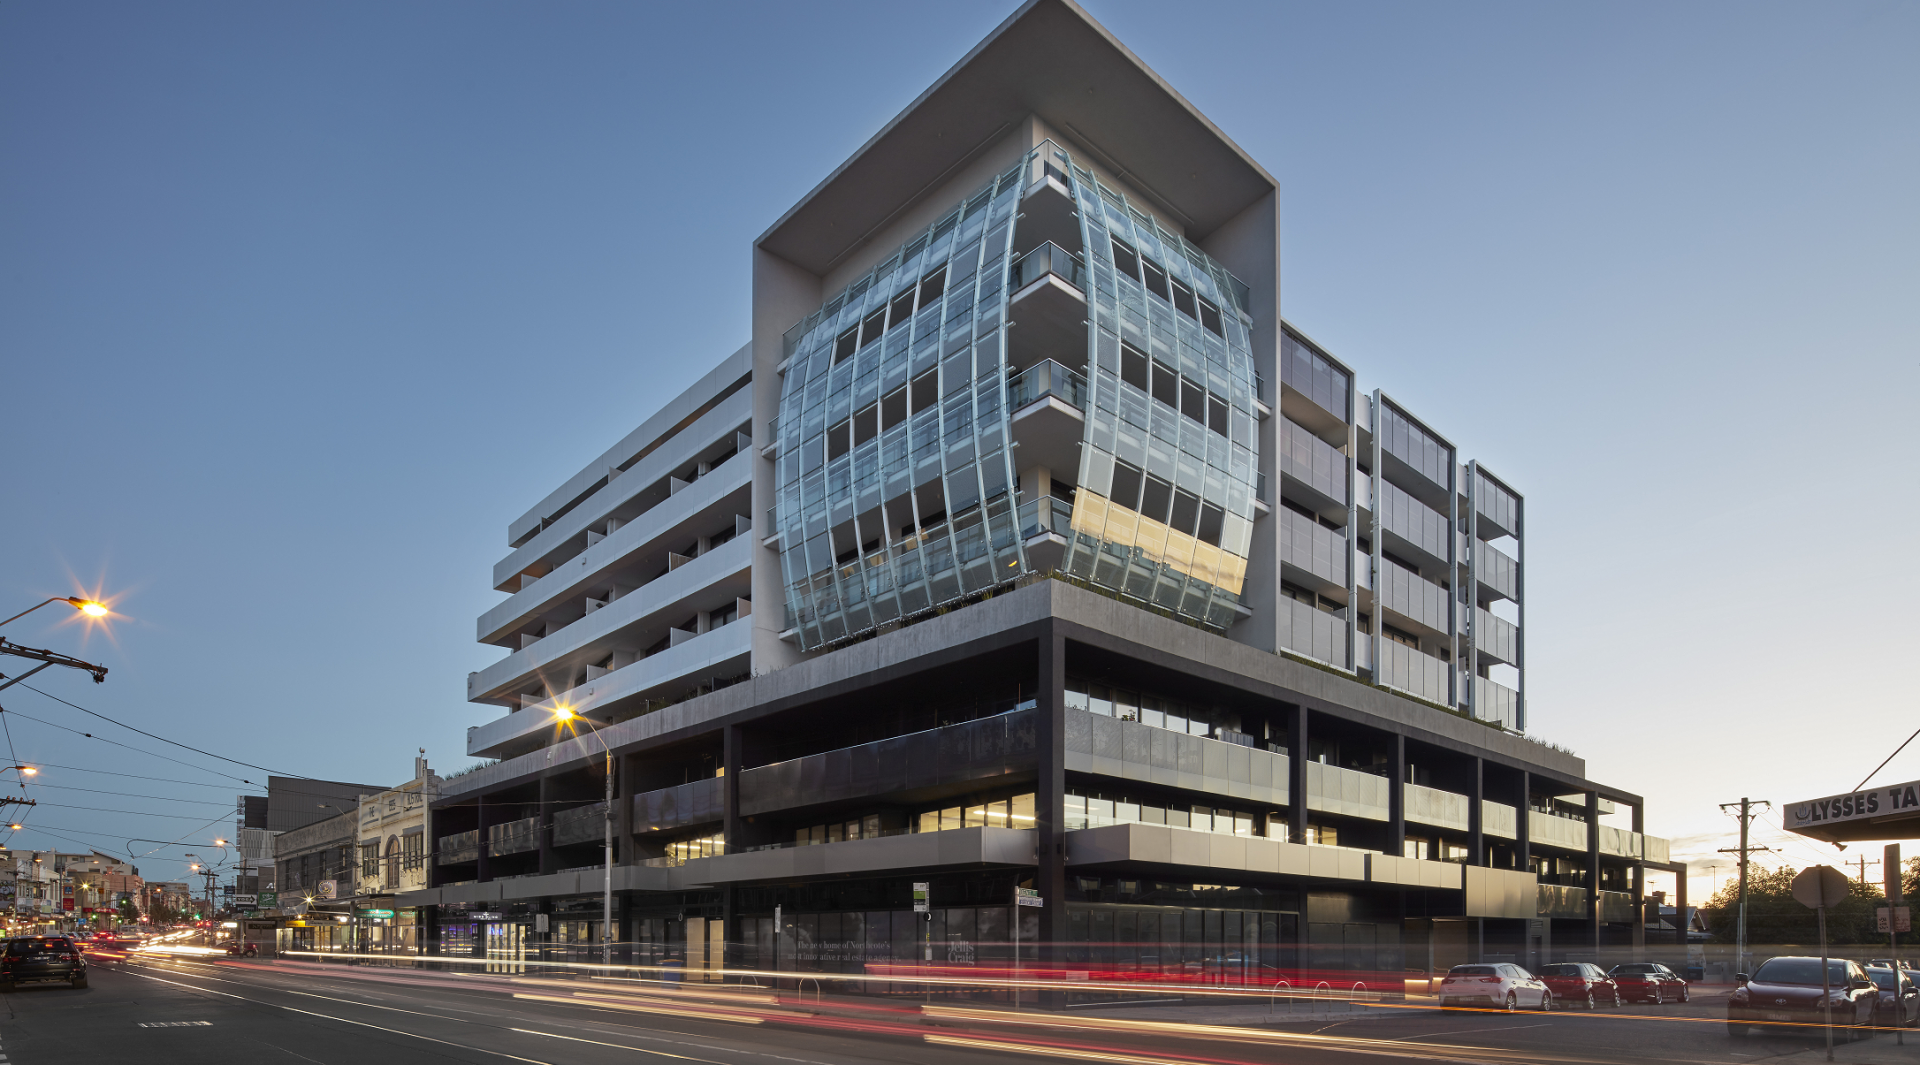 C. Kairouz Architects